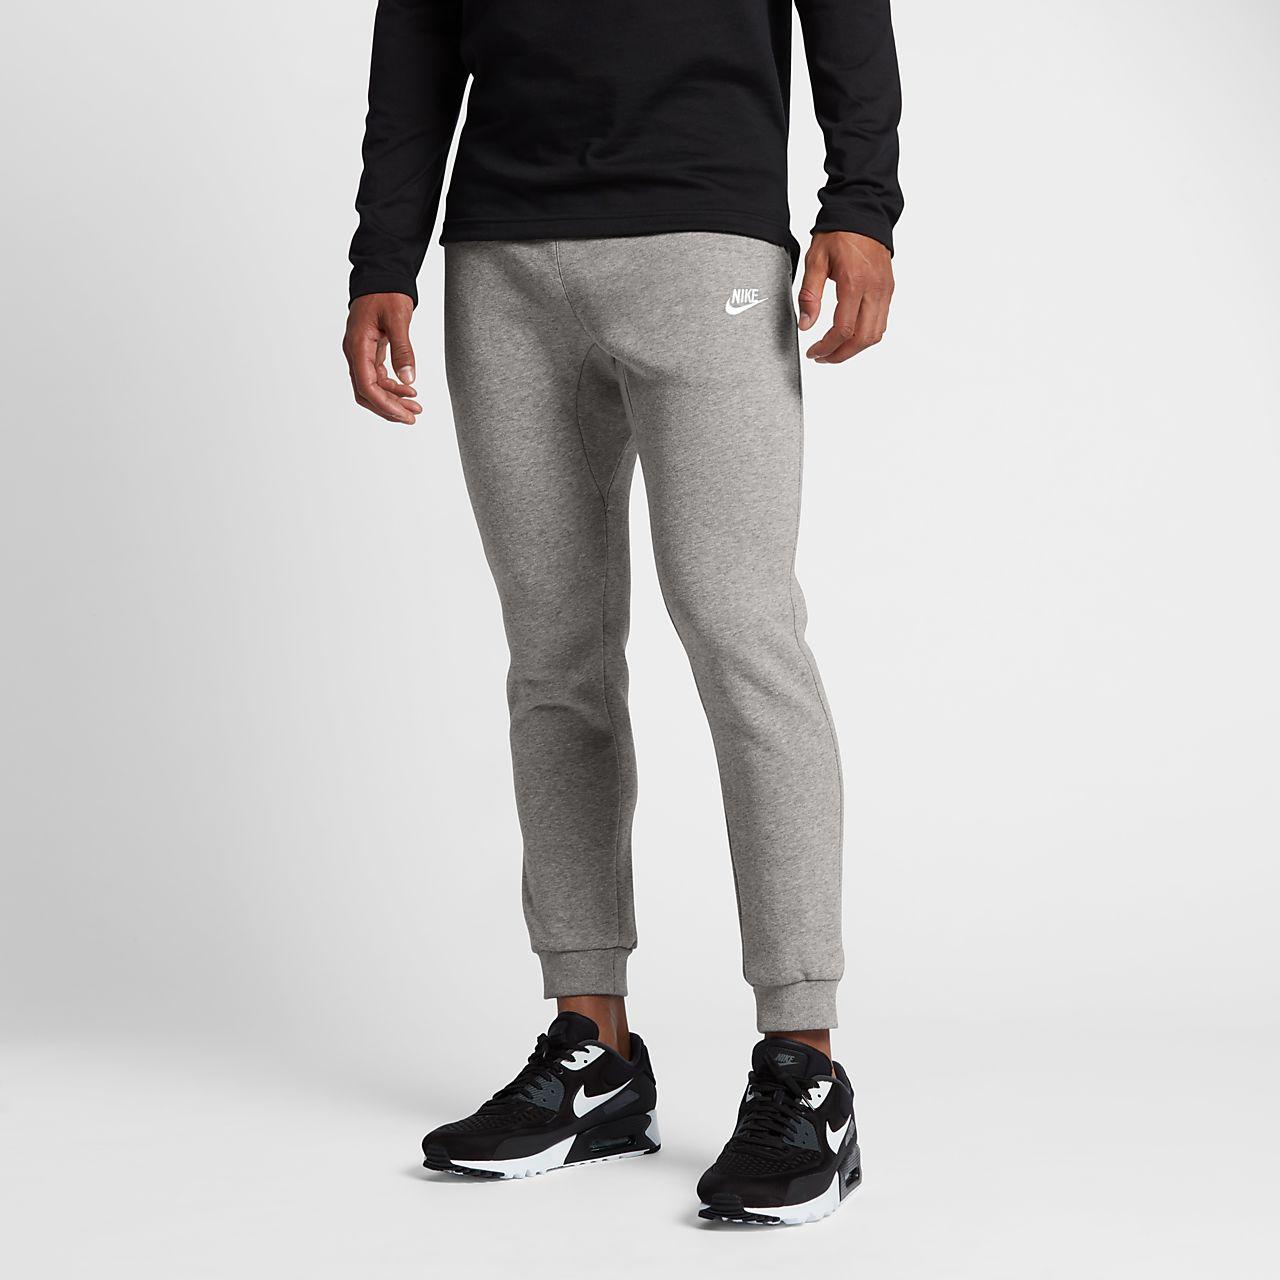 Nike Sportswear Men s Joggers. Nike.com AU 78256d6faf9e